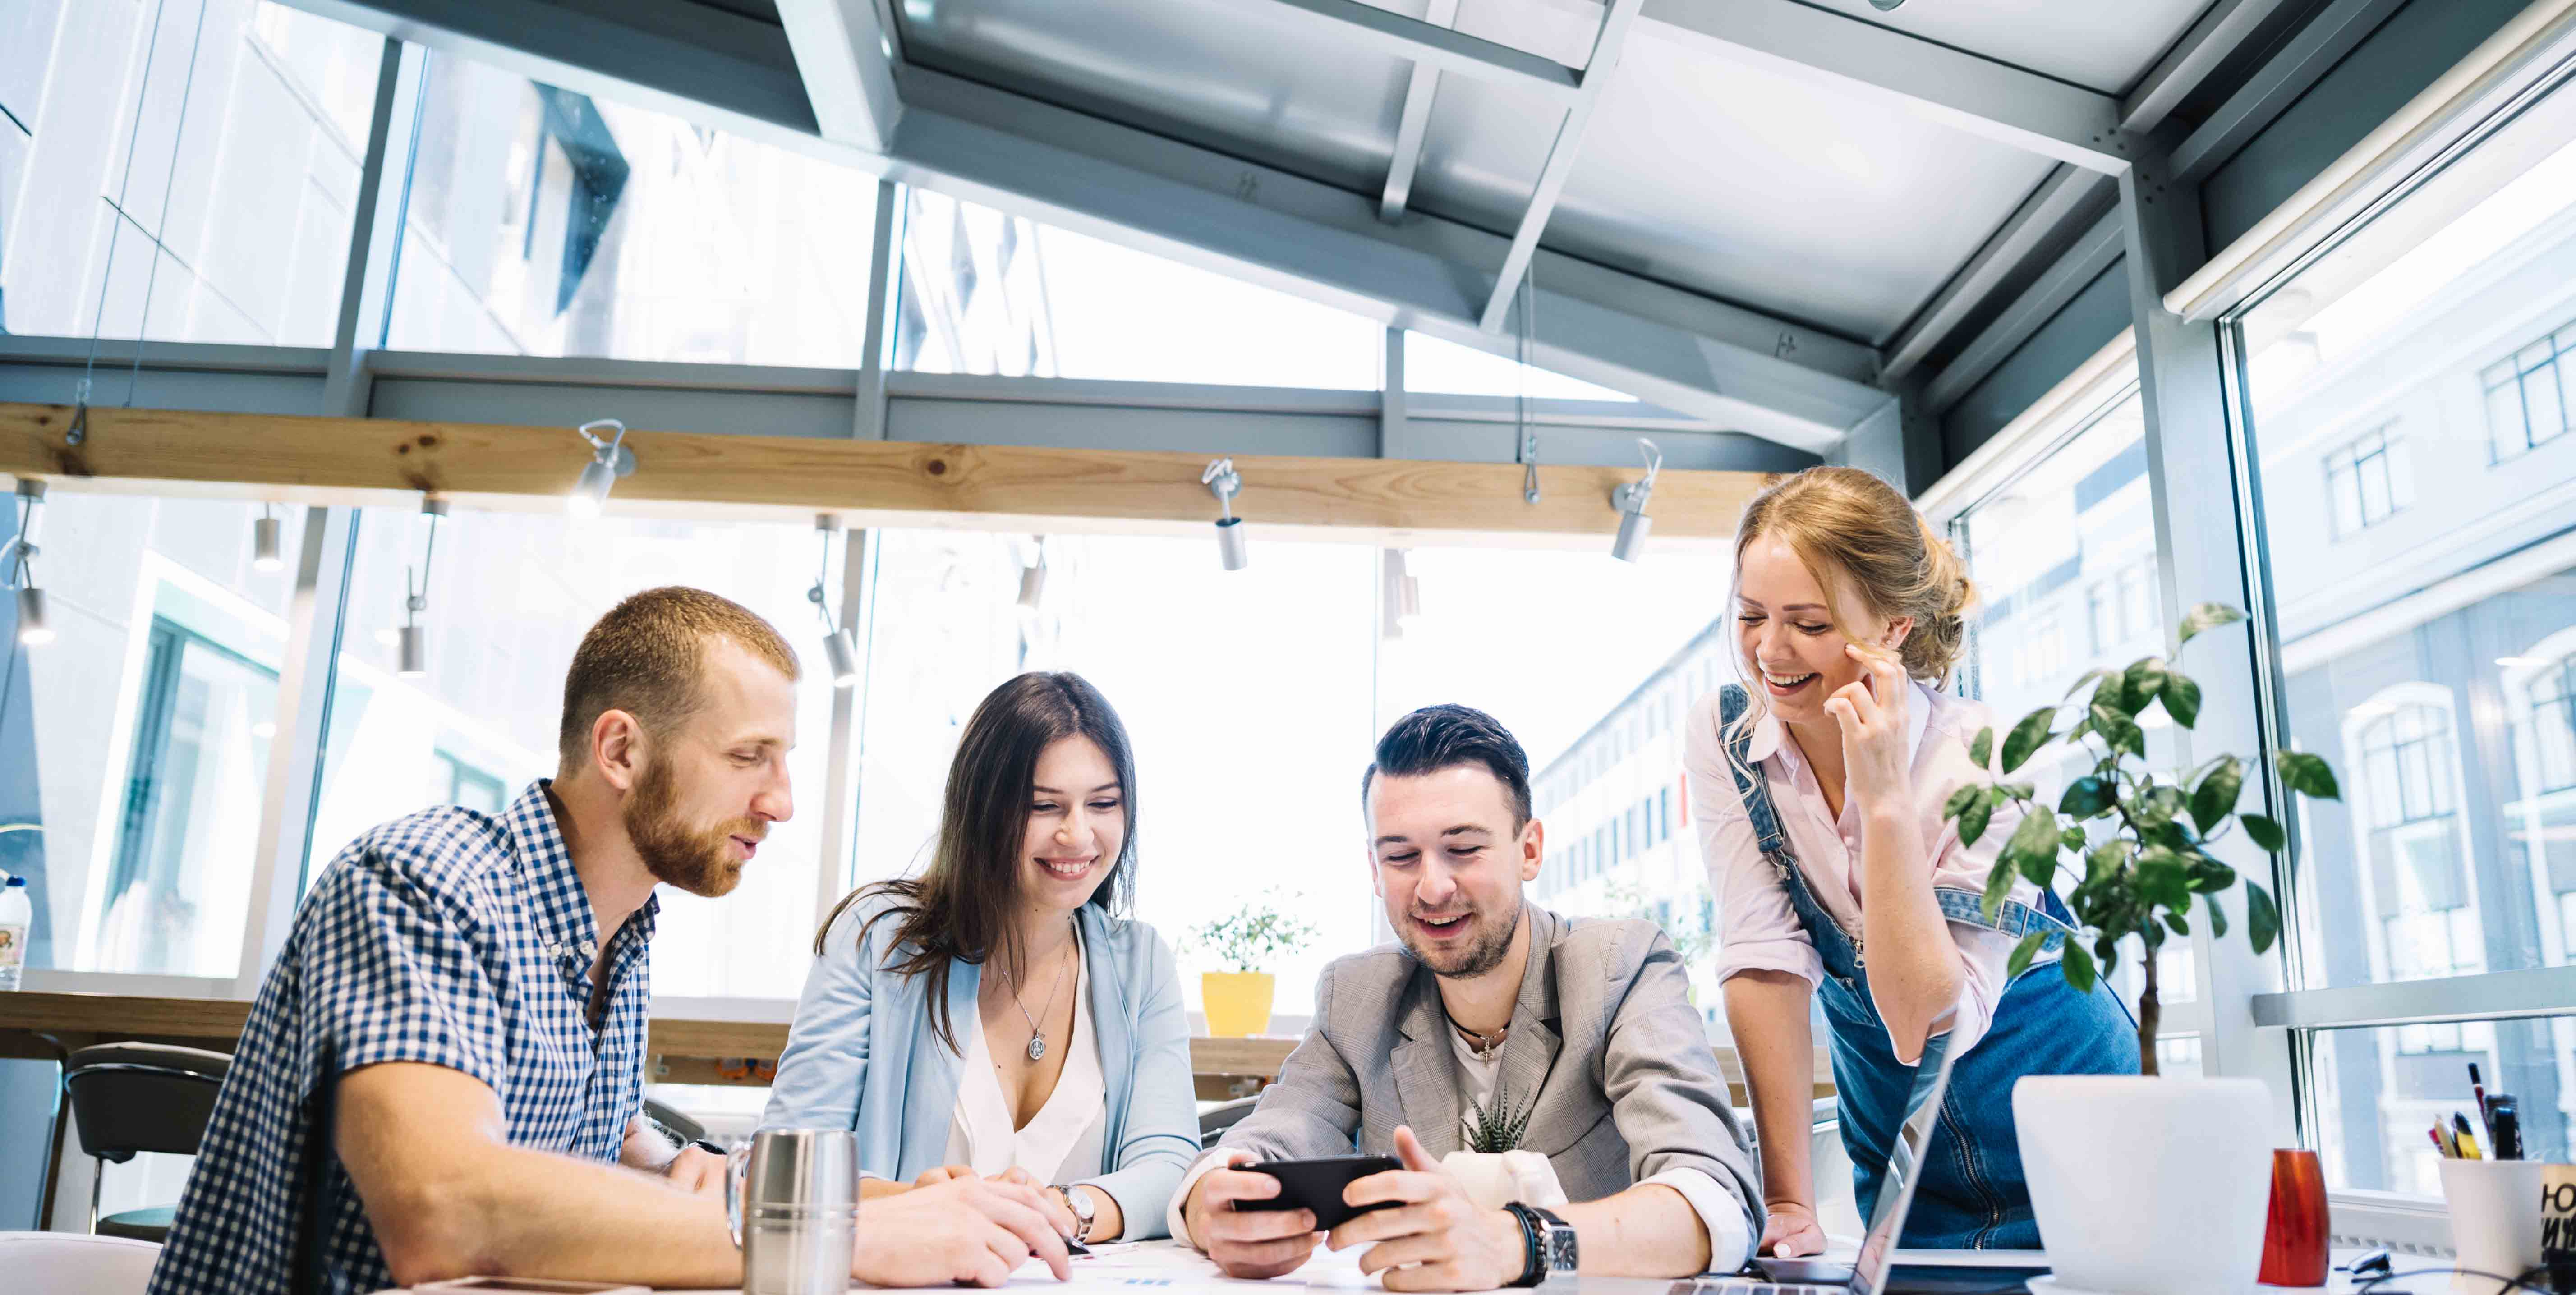 Etude sur le coworking en 2019